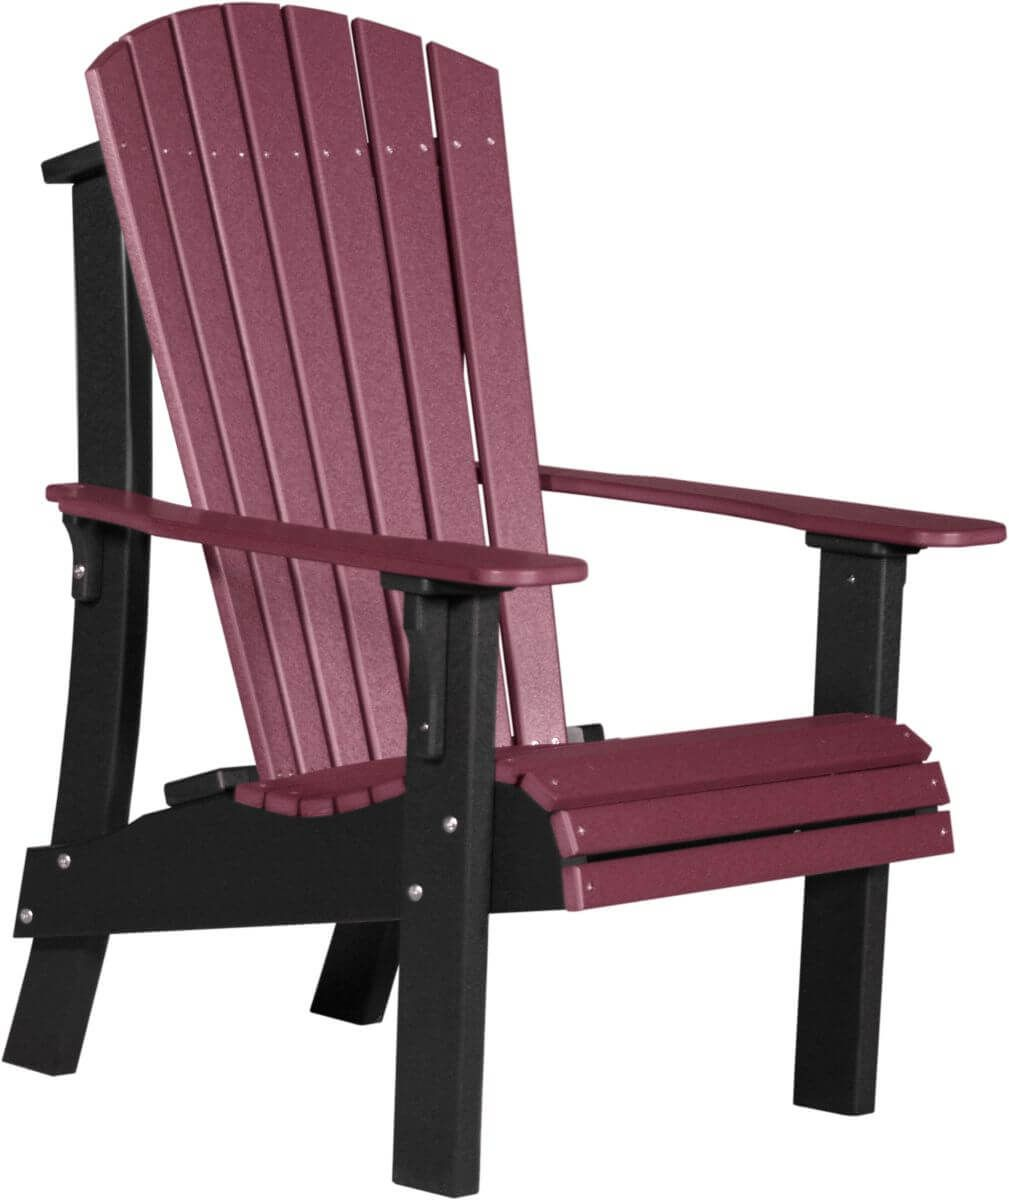 Cherrywood and Black Rockaway Highback Adirondack Chair